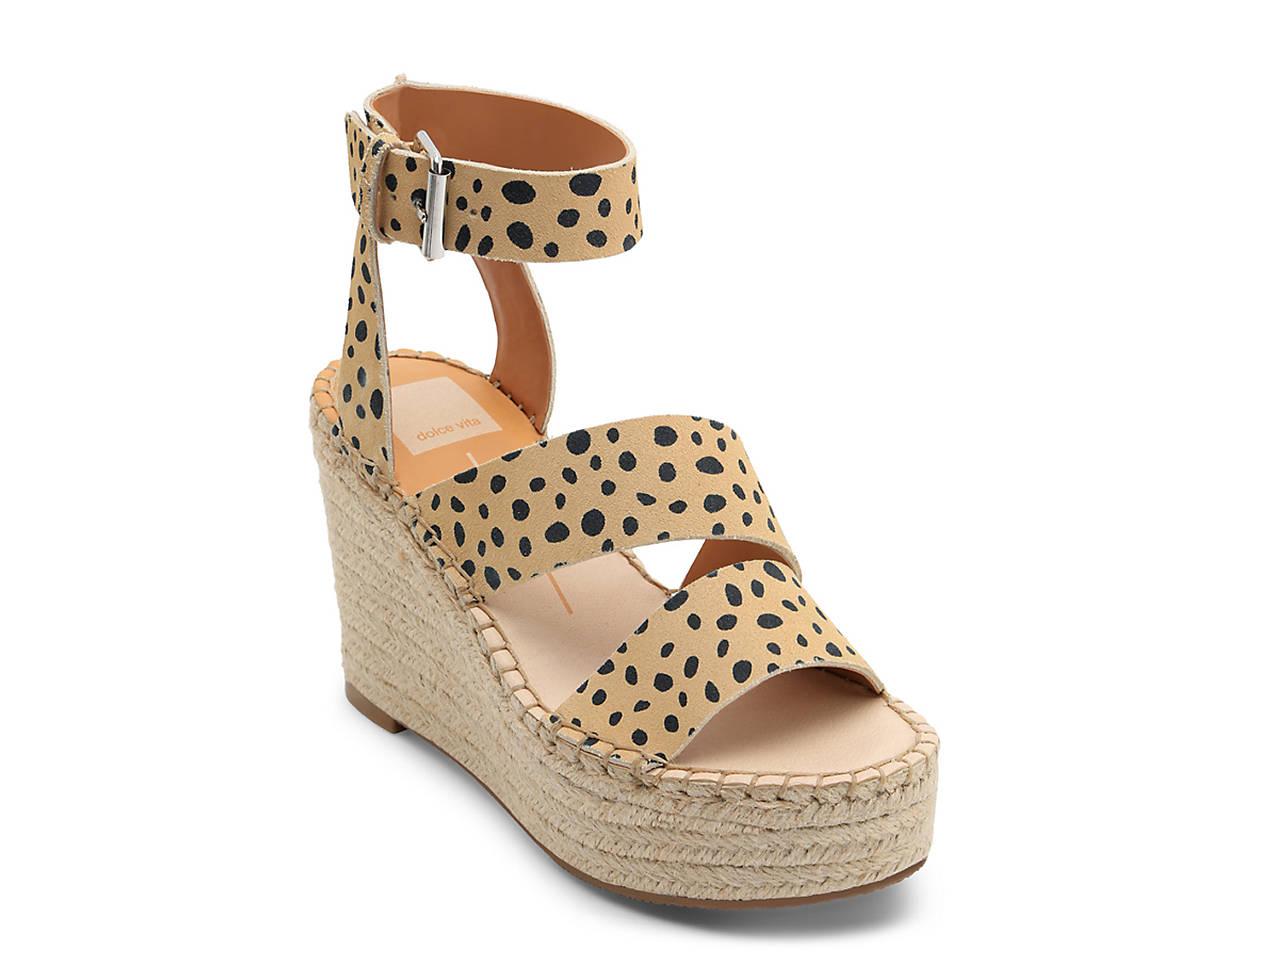 b082784f078 Shayla Espadrille Wedge Sandal